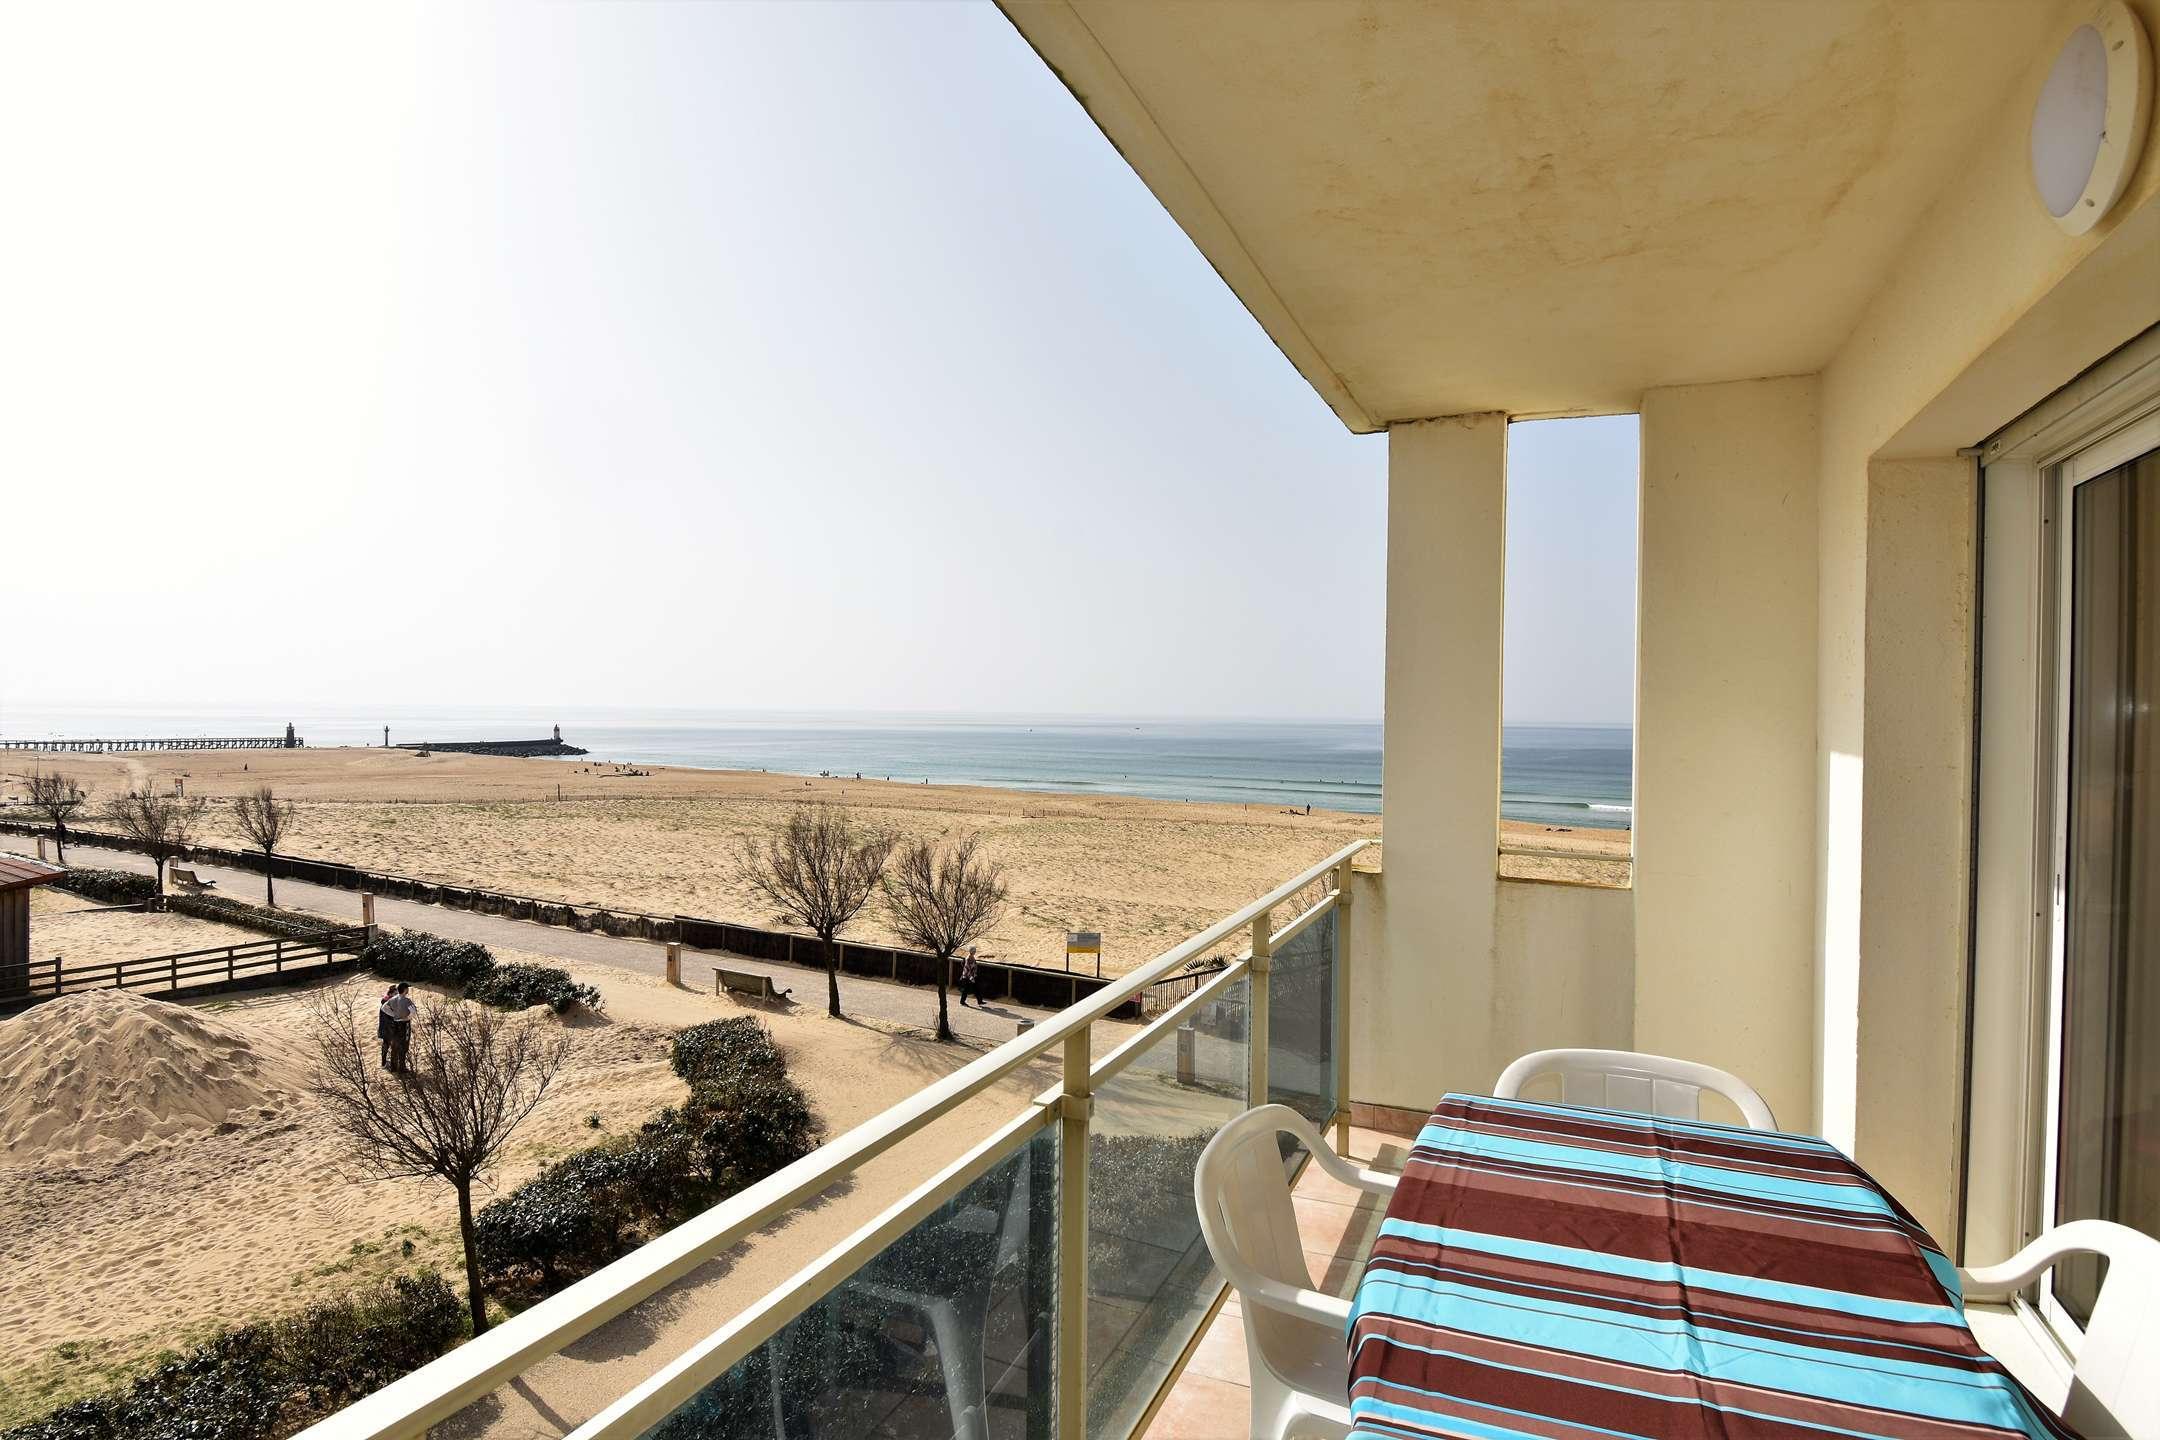 location de vacances à Hossegor ref:0045